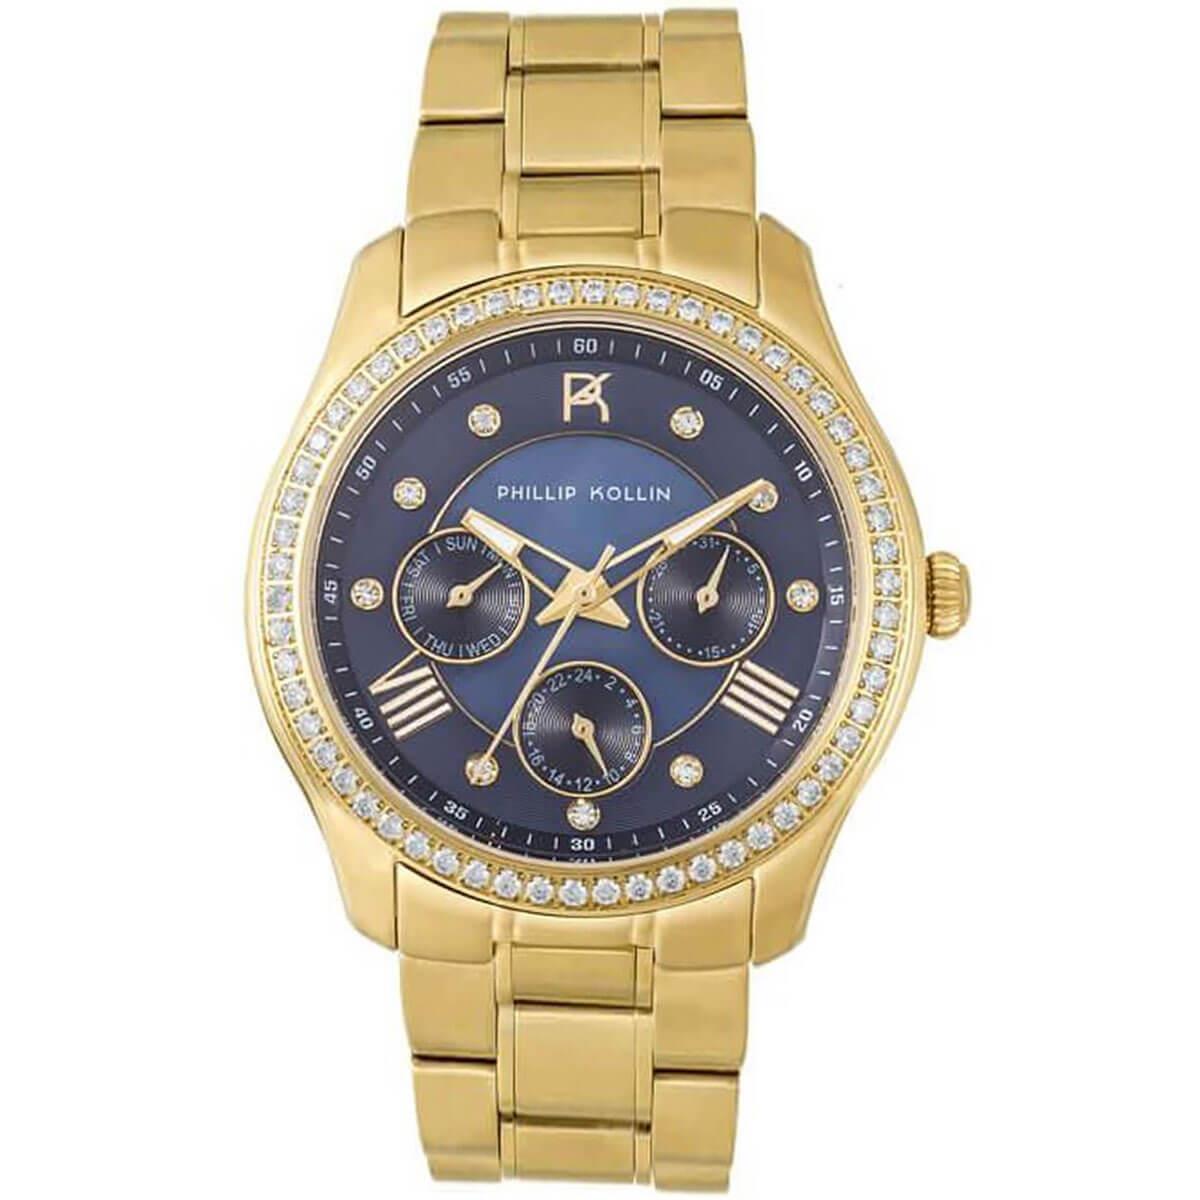 99b776677b5 Relógio Feminino Phillip Kollin Monte Carlo ZY28083A Gold Blue Diamond